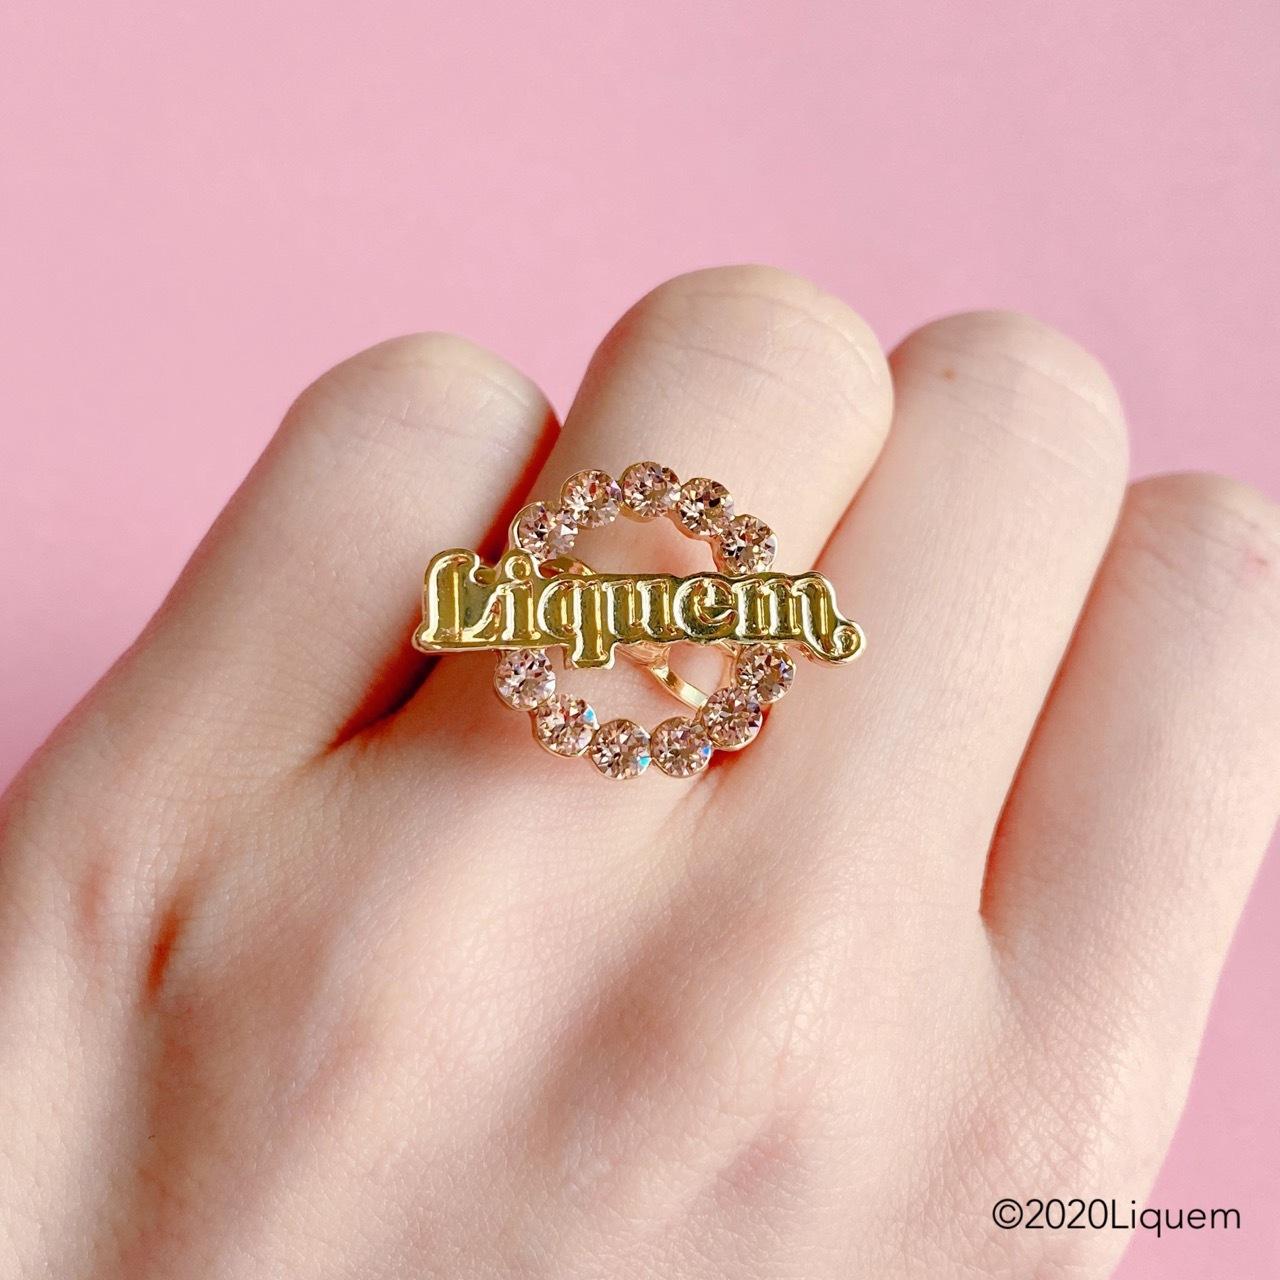 Liquem / LOGO リング(GLD)